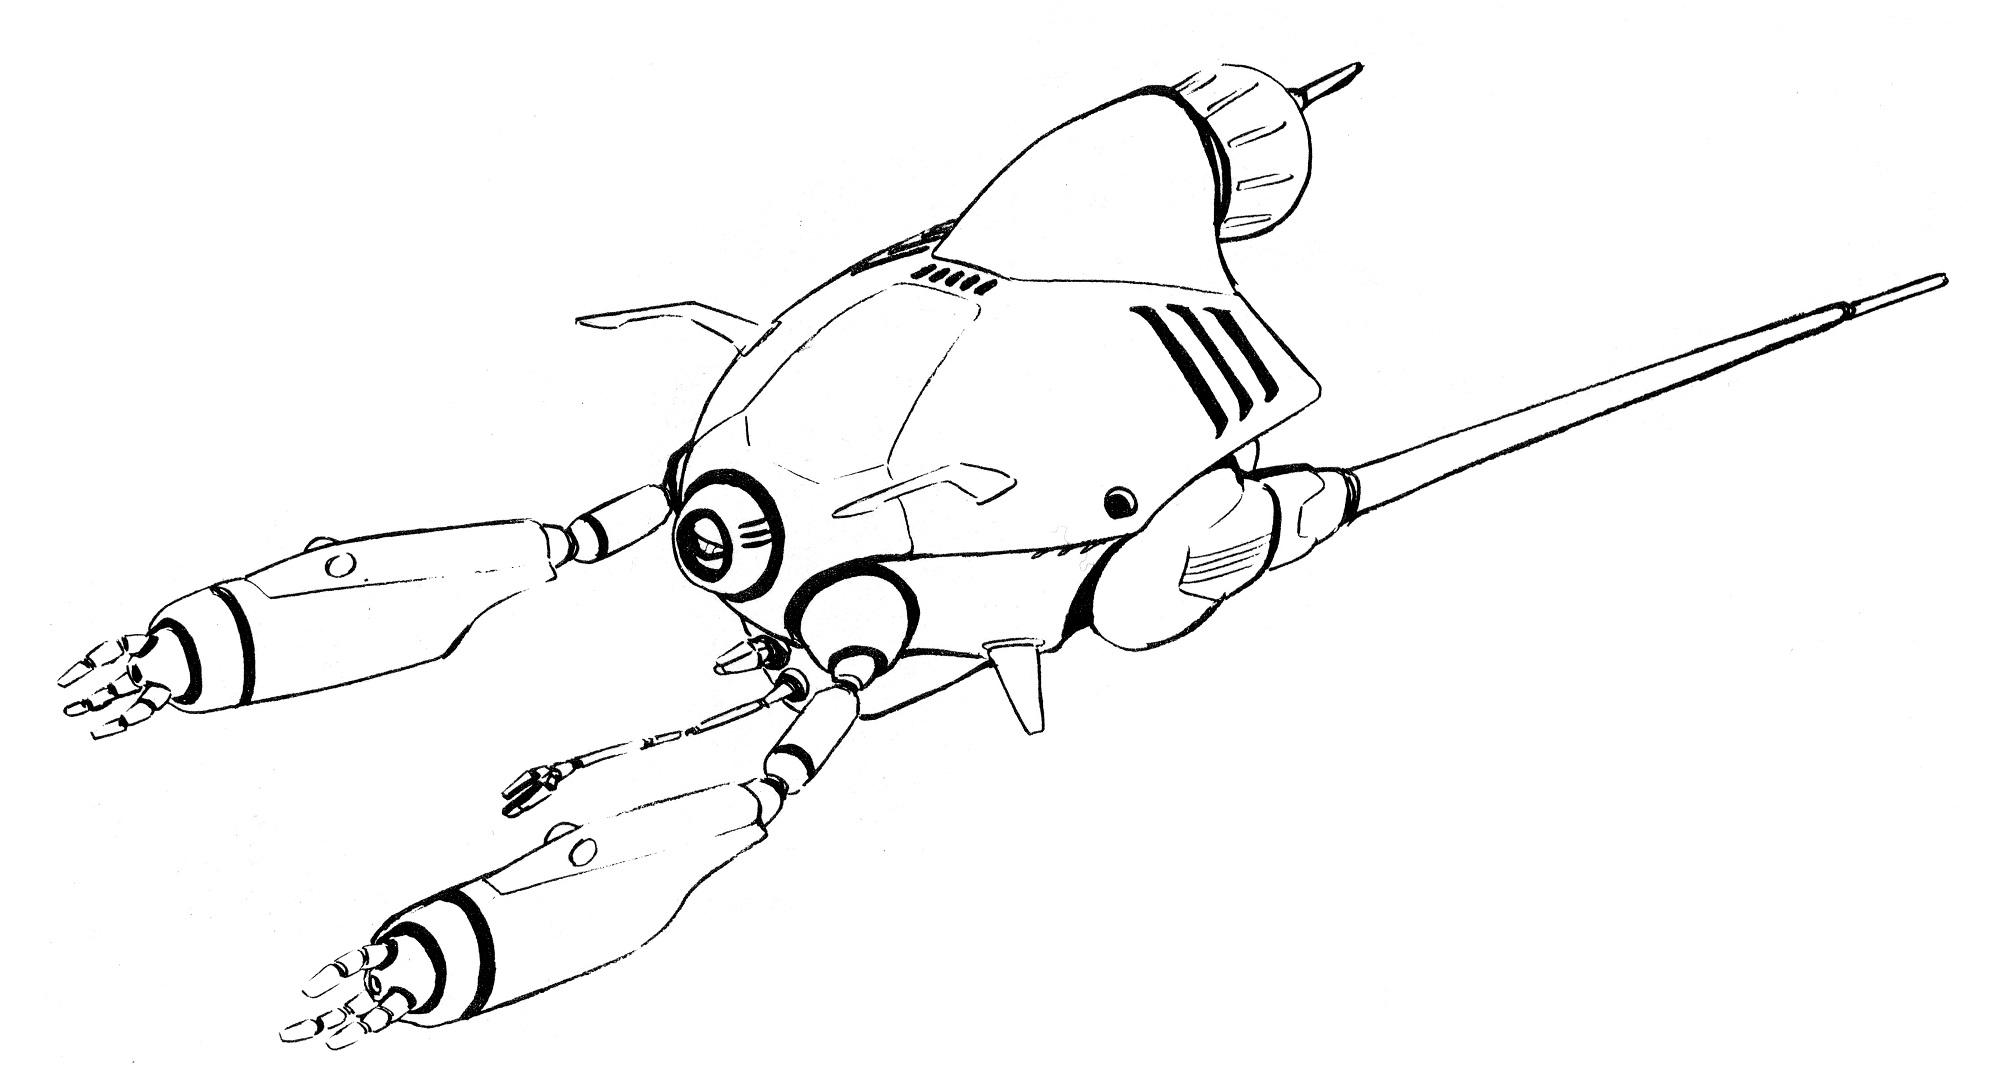 Gimi Kur Trama Salvage And Repair Spacecraft